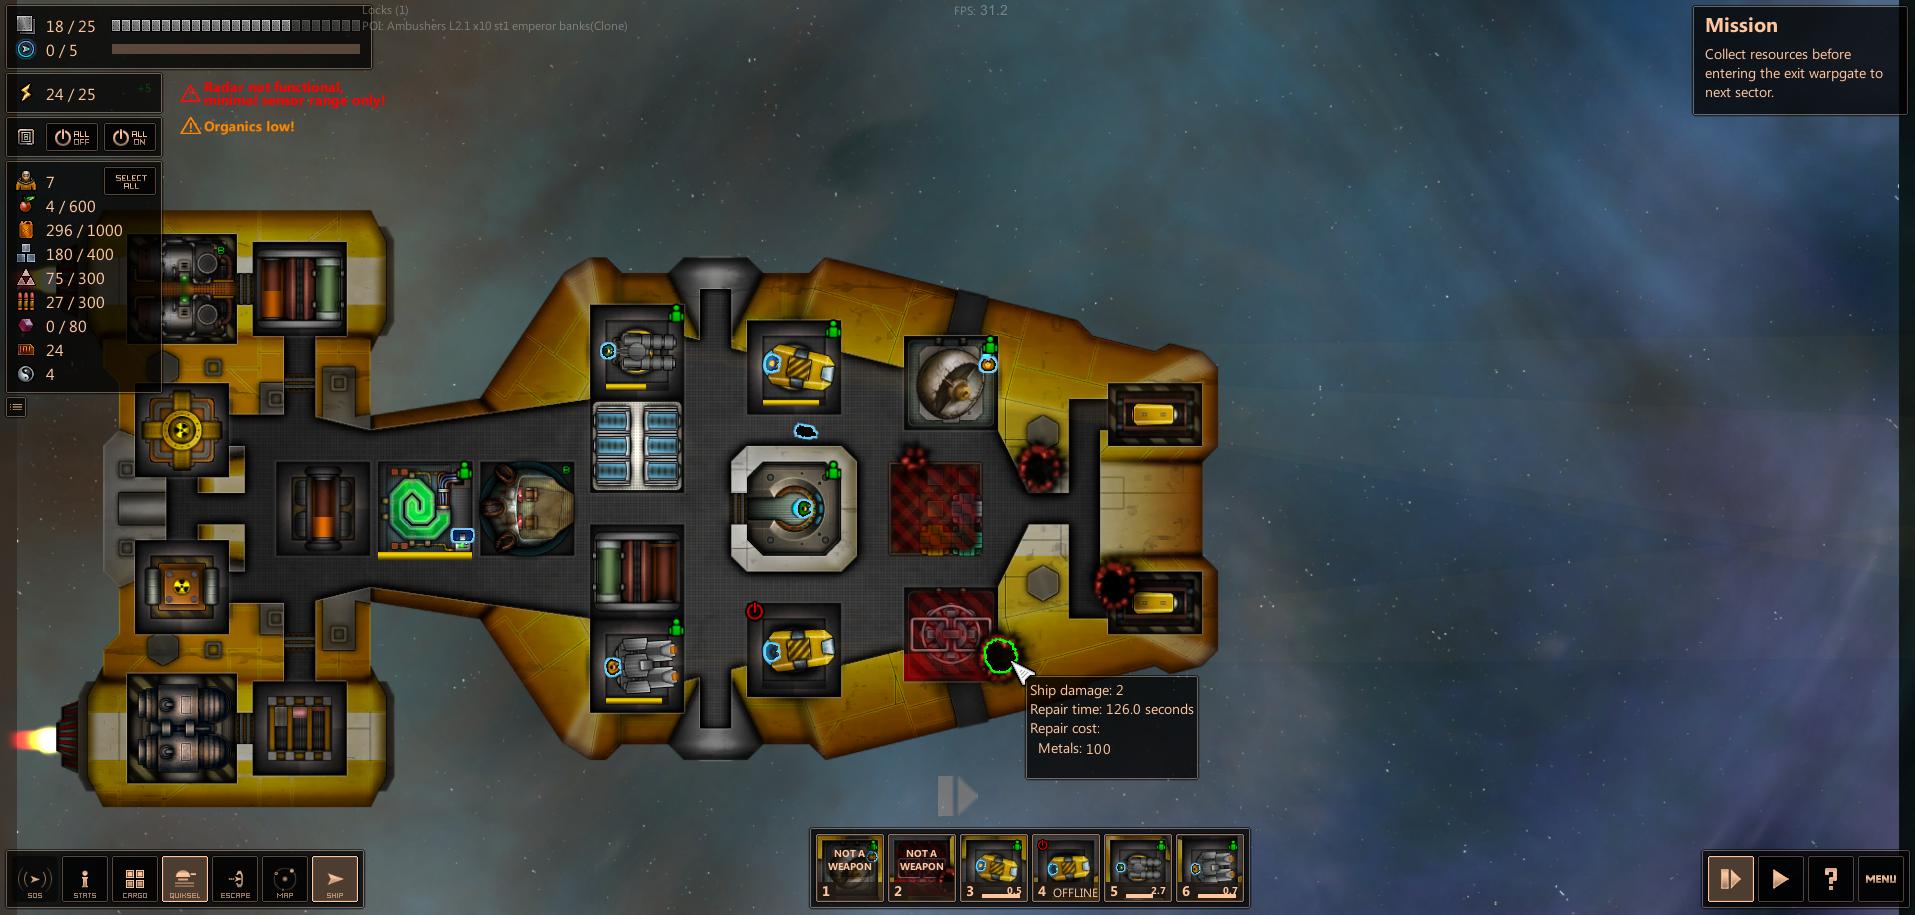 Damage tokens on ship